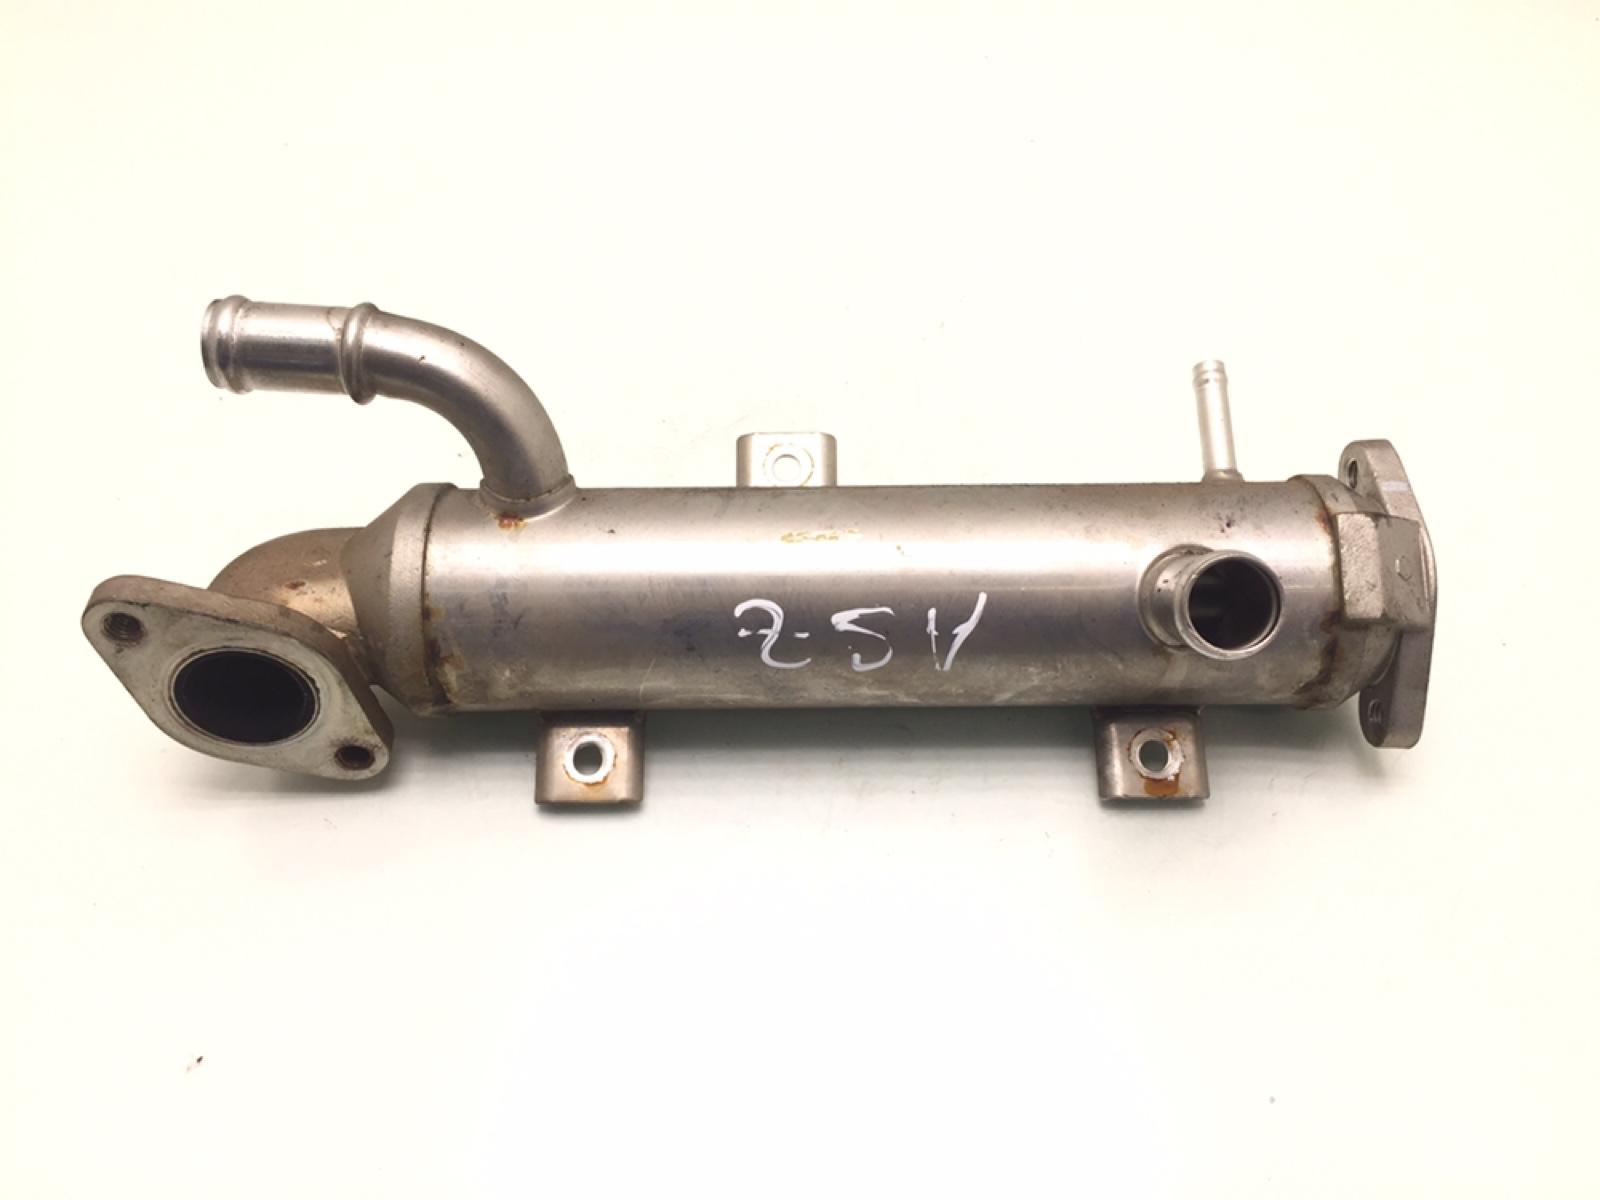 Радиатор egr Volkswagen Bora 1.9 TDI 2004 (б/у)